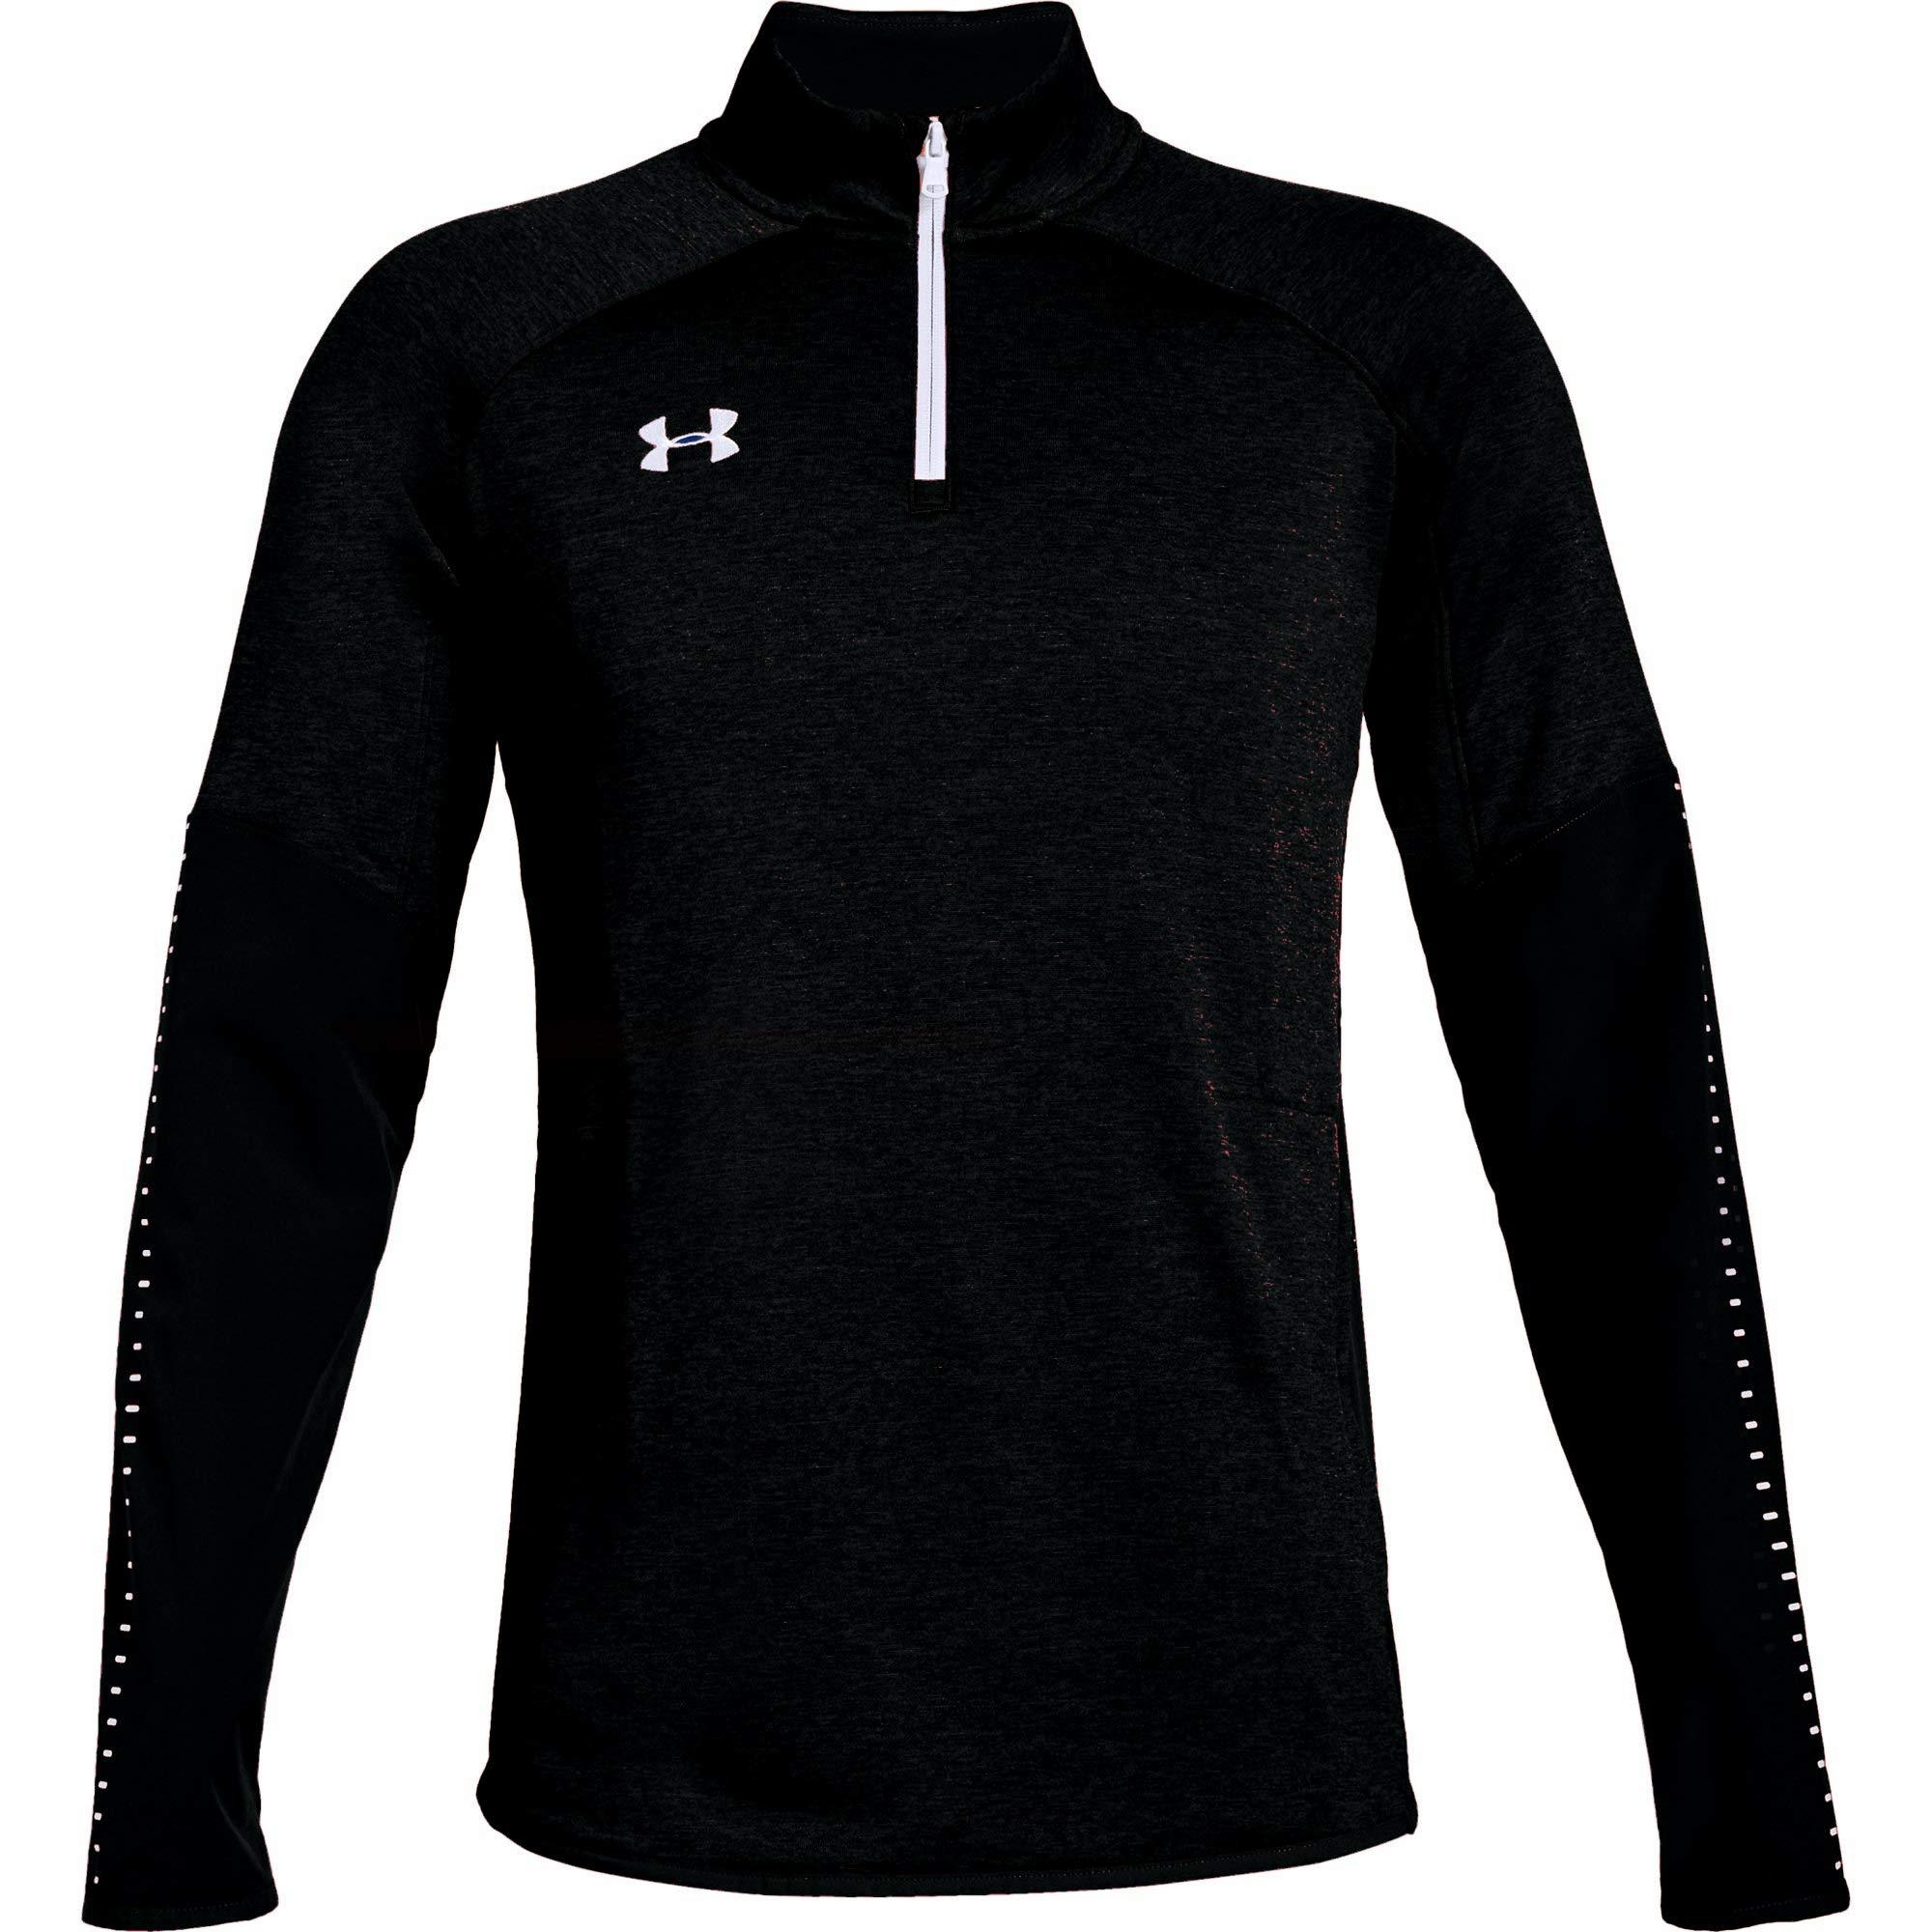 Under Armour Men's UA Qualifier Hybrid 1/4 Zip Long Sleeve (Small, Black)